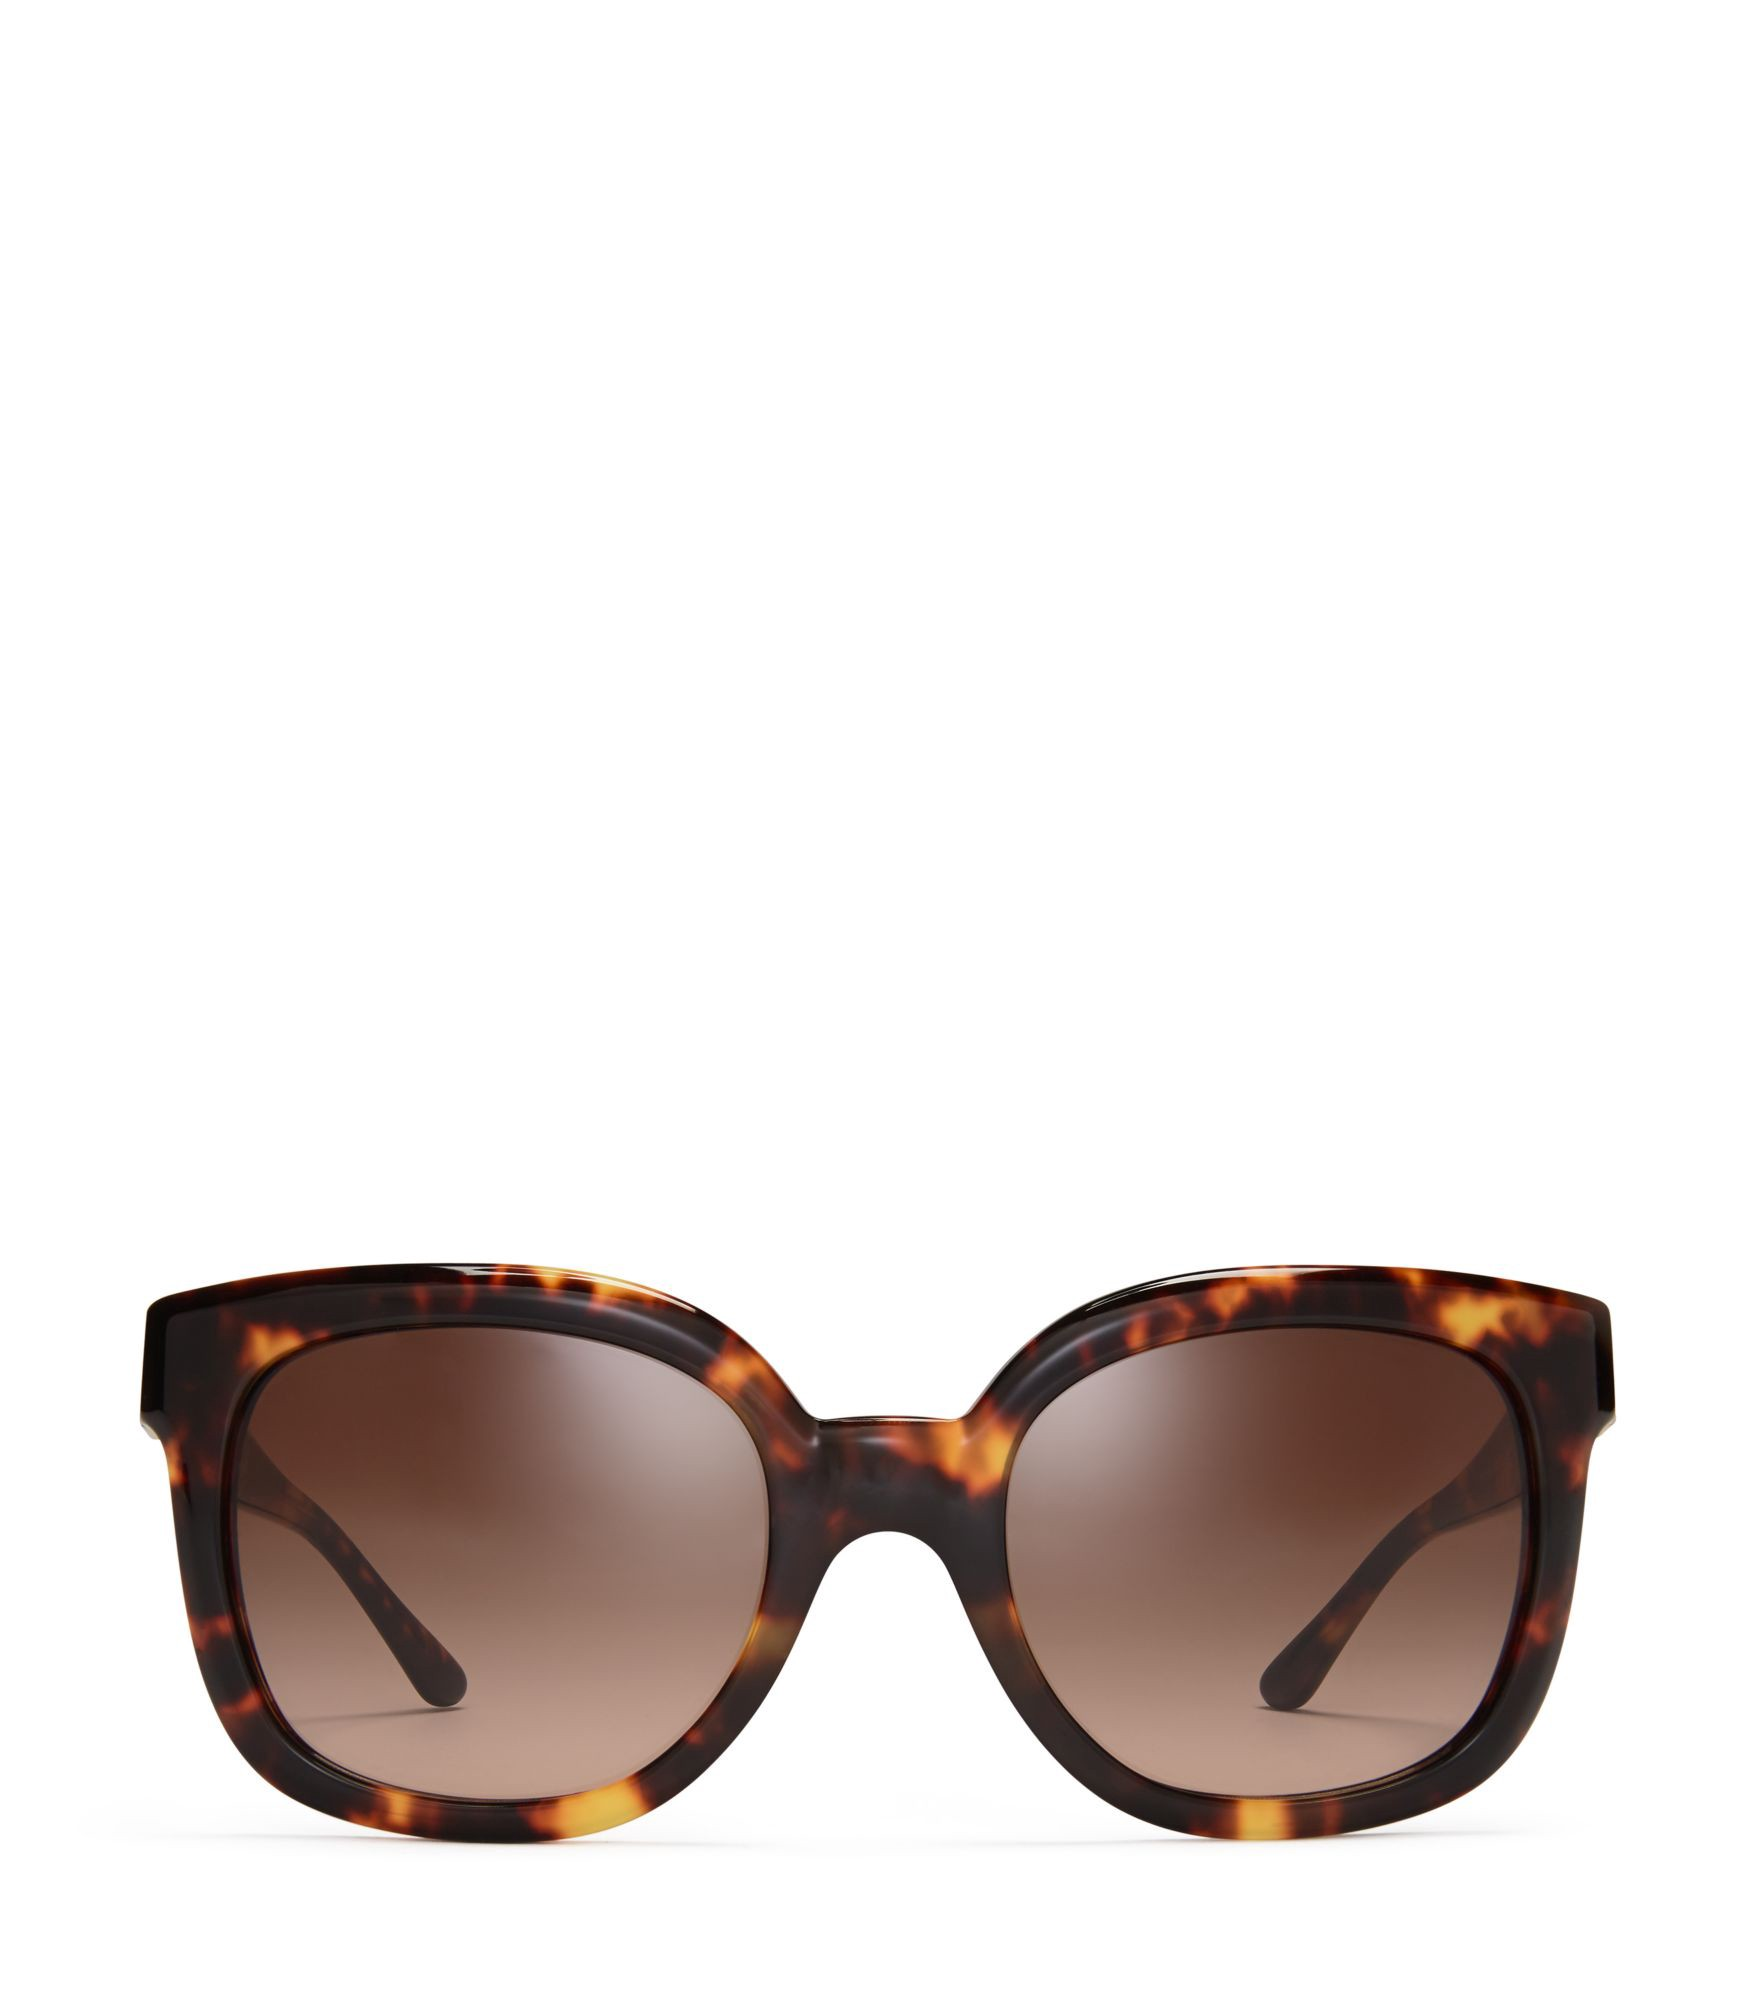 Tory Burch Modern T Cat Eye Sunglasses Vintage Tortoise